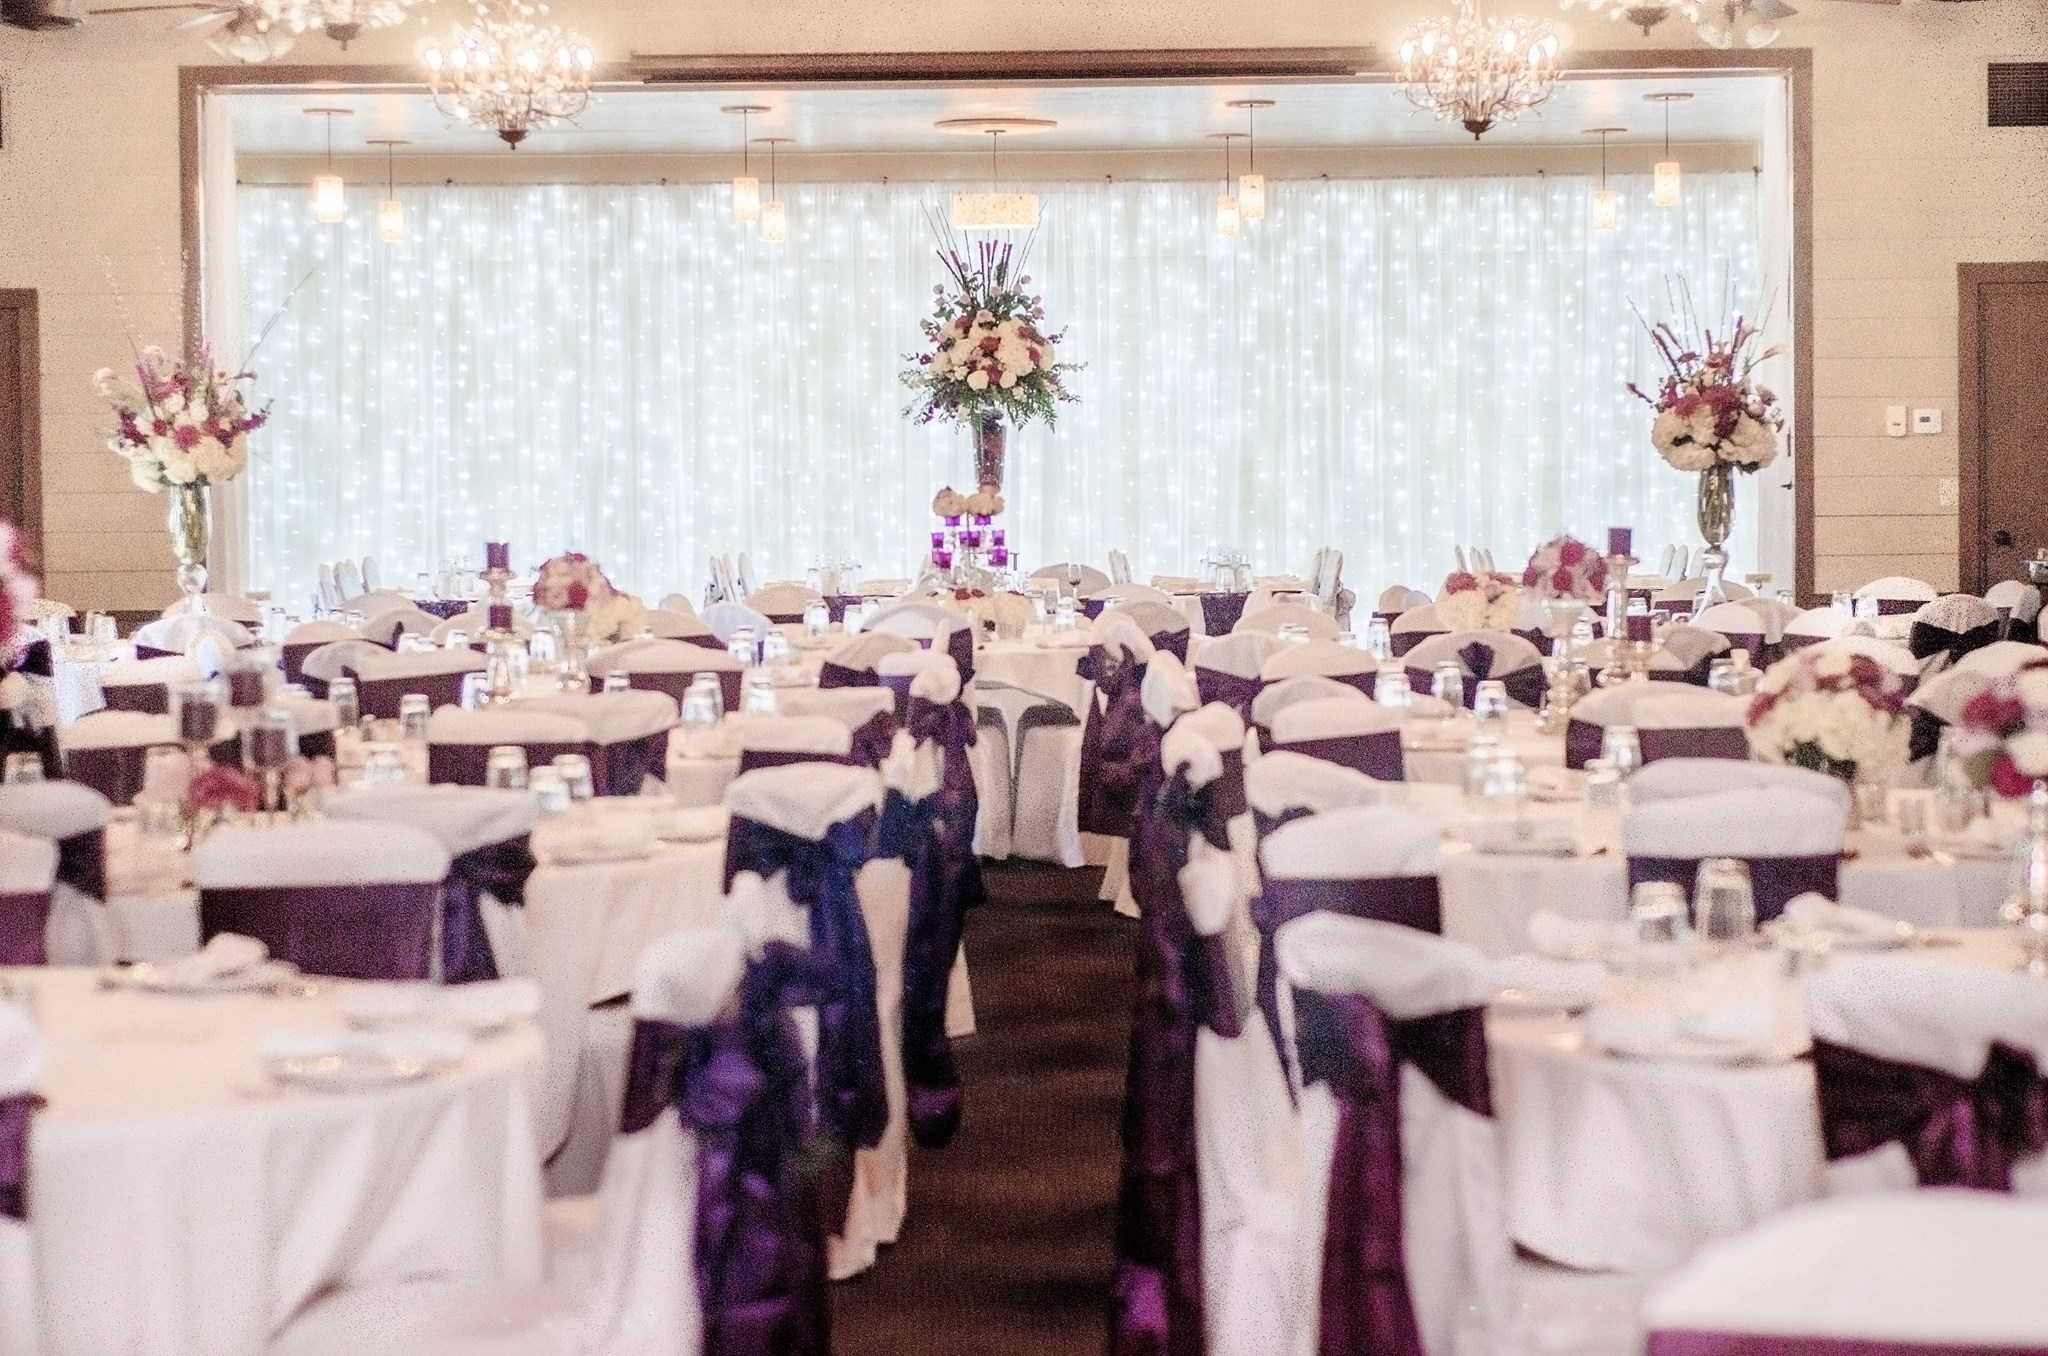 Elite Banquet & Conference Center4